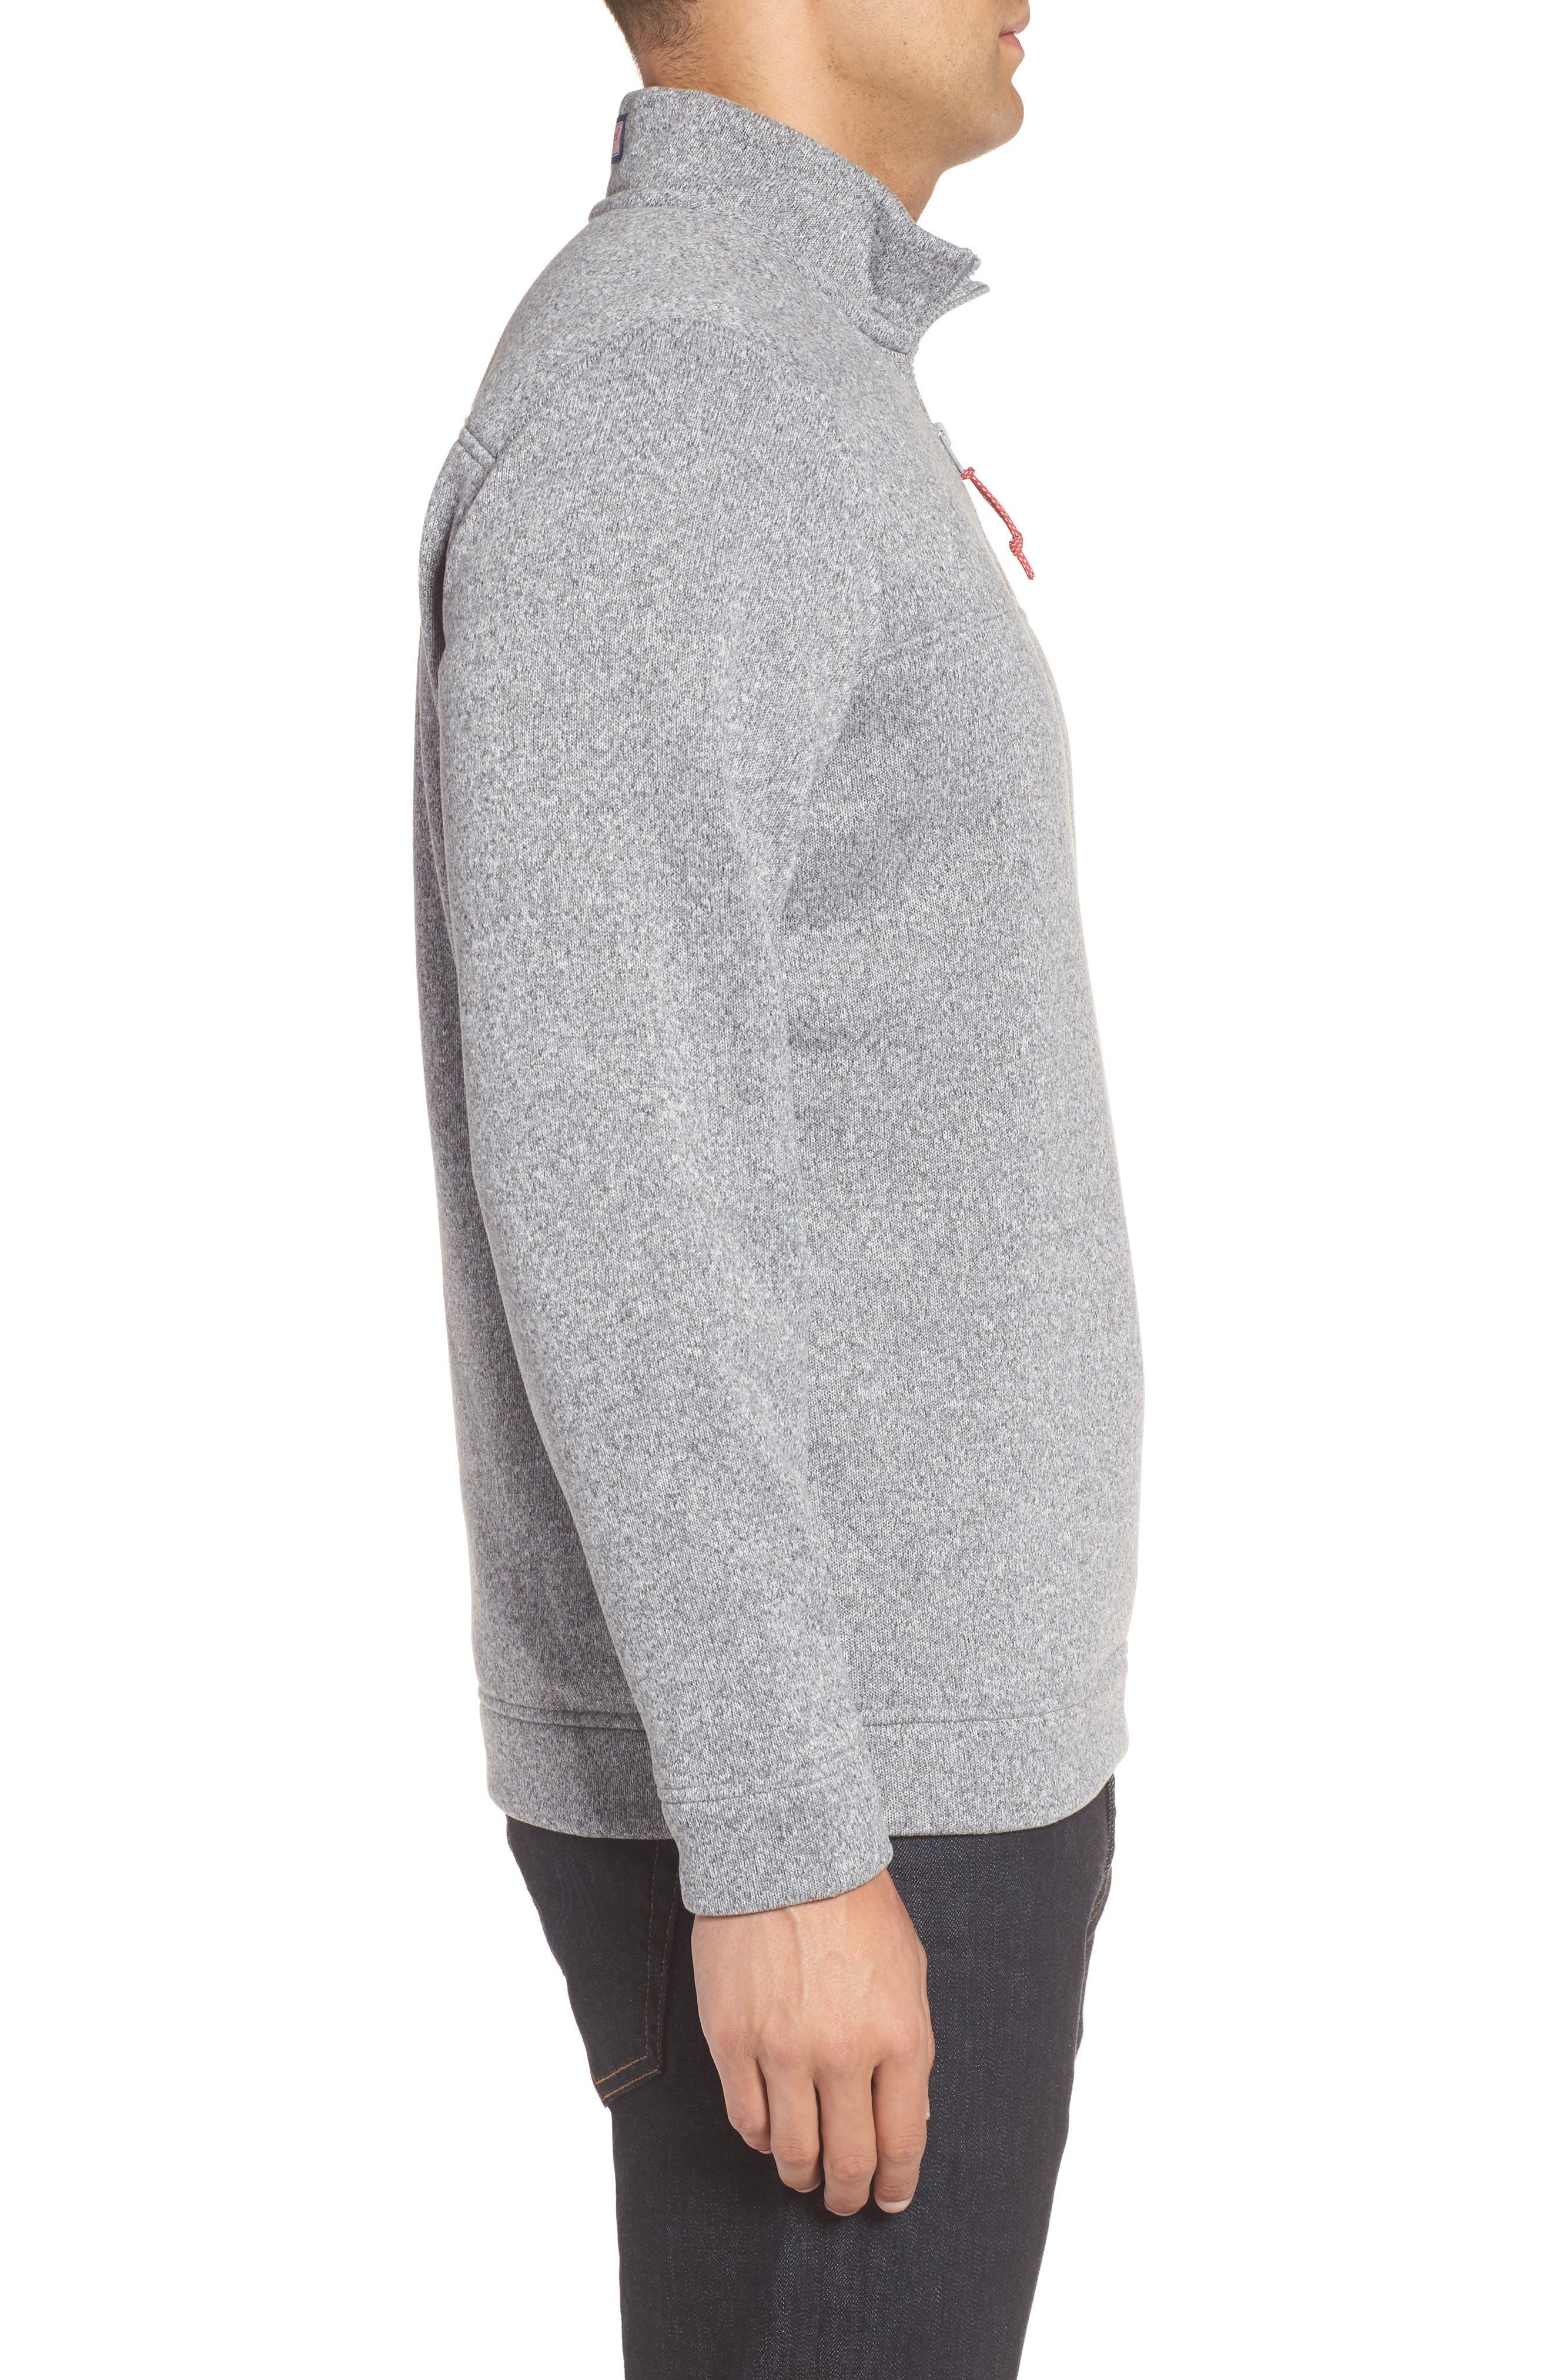 Alternate Image 3  - vineyard vines Shep Sweater Fleece Quarter Zip Pullover